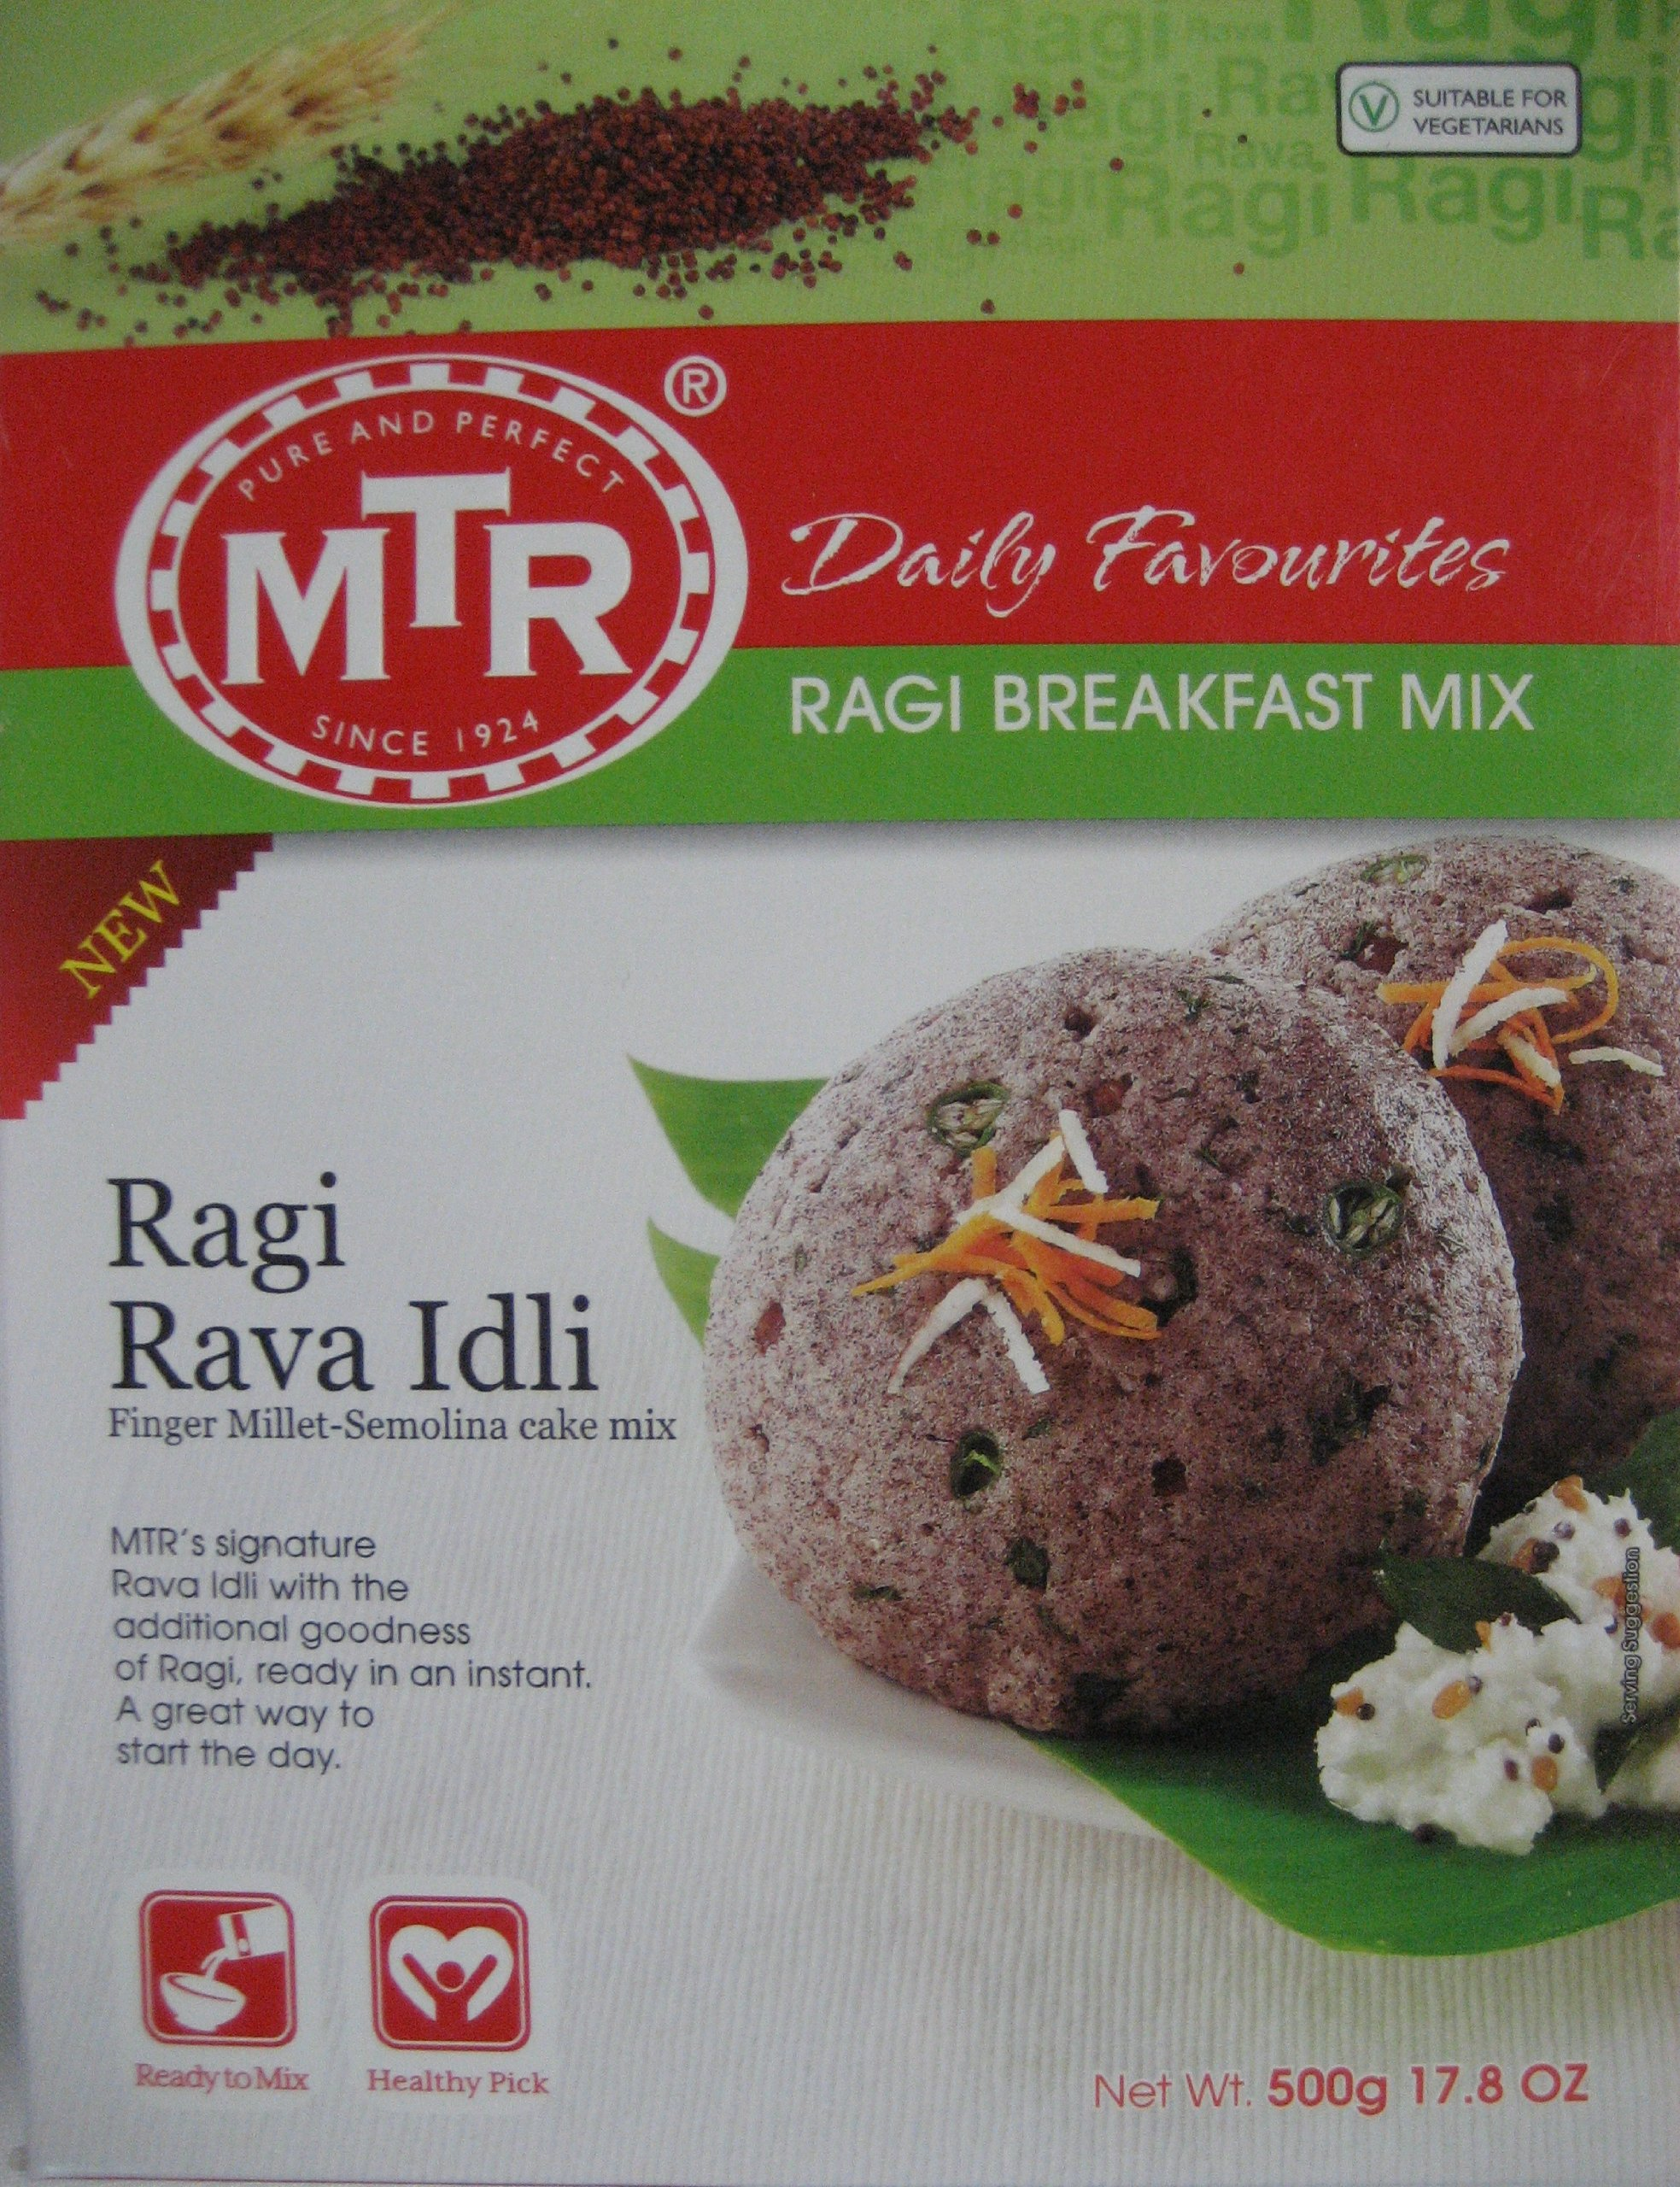 MTR Ragi Rava Idli 500 Gm (Pack of 2) (Free Shipping) by Subhlaxmi Grocers